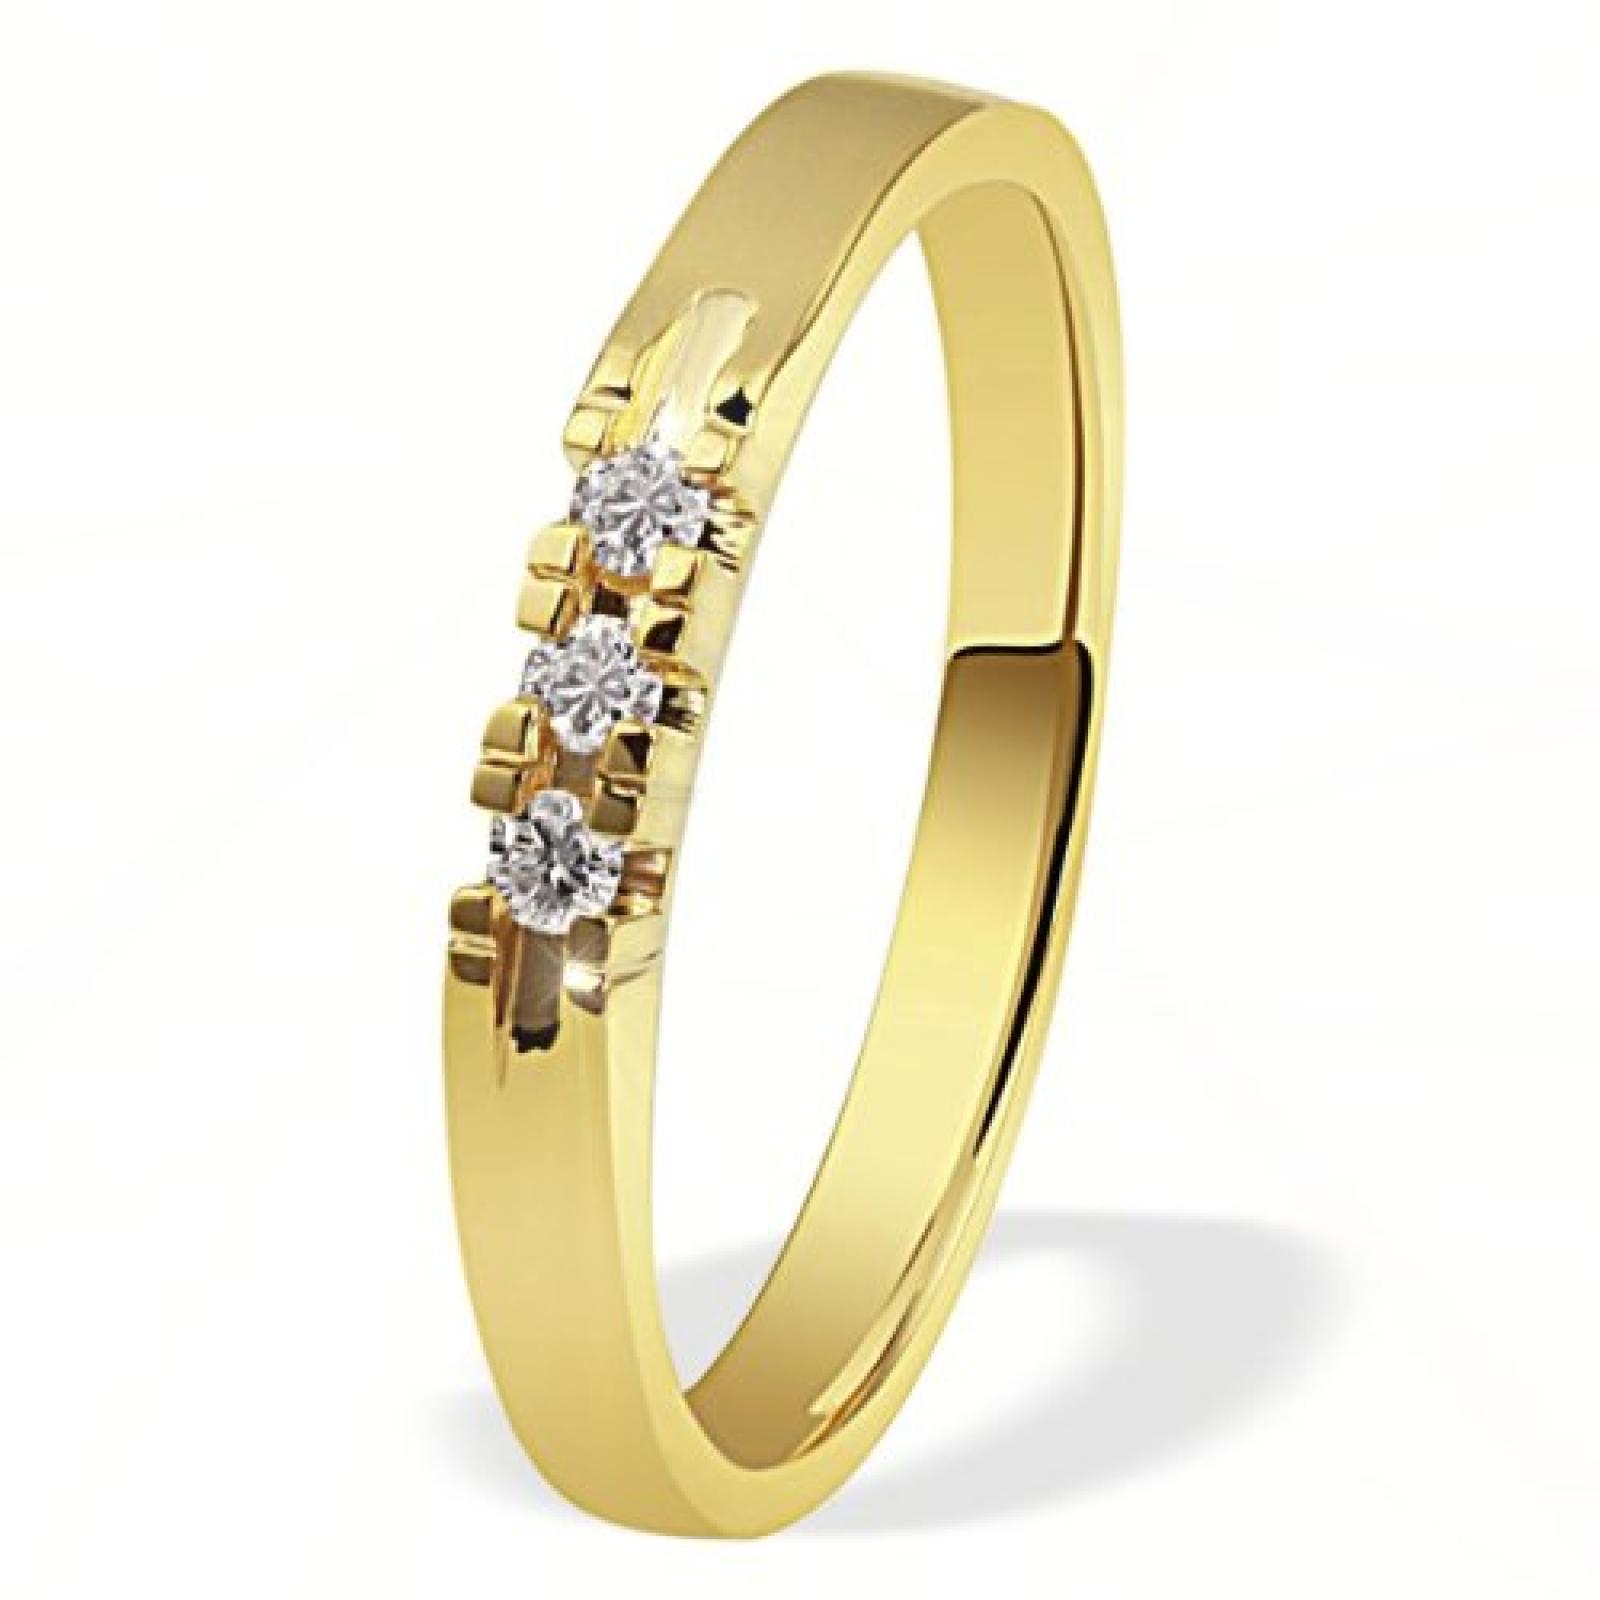 Goldmaid Damen-Ring 585 Gelbgold 3 Brillanten 0,09ct Memoire Me R4716GG